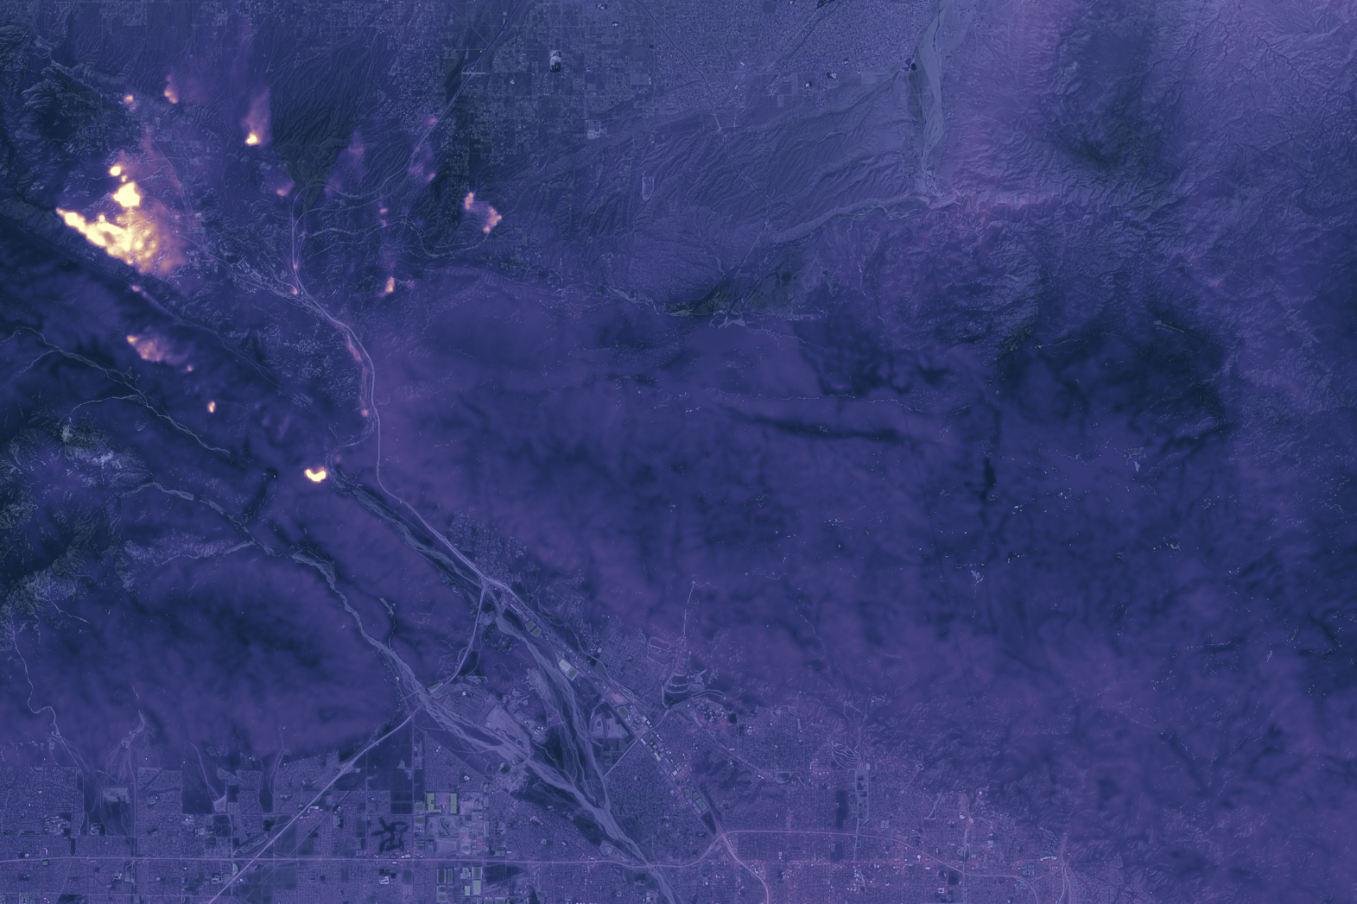 L'incendie Blue Cut vu de l'espace